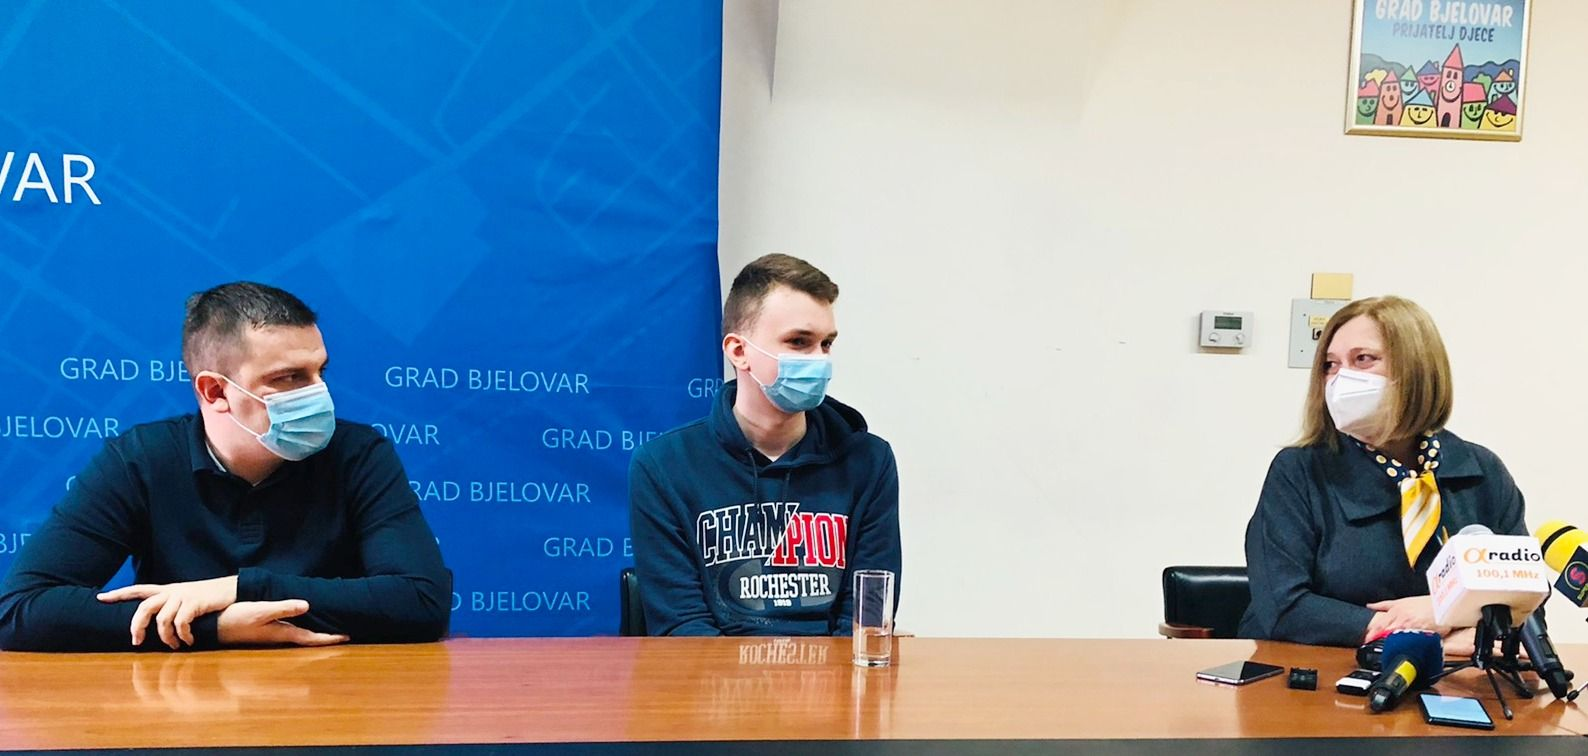 Državnog prvaka iz kemije Dejana Tomića i njegovu mentoricu primio gradonačelnik Hrebak